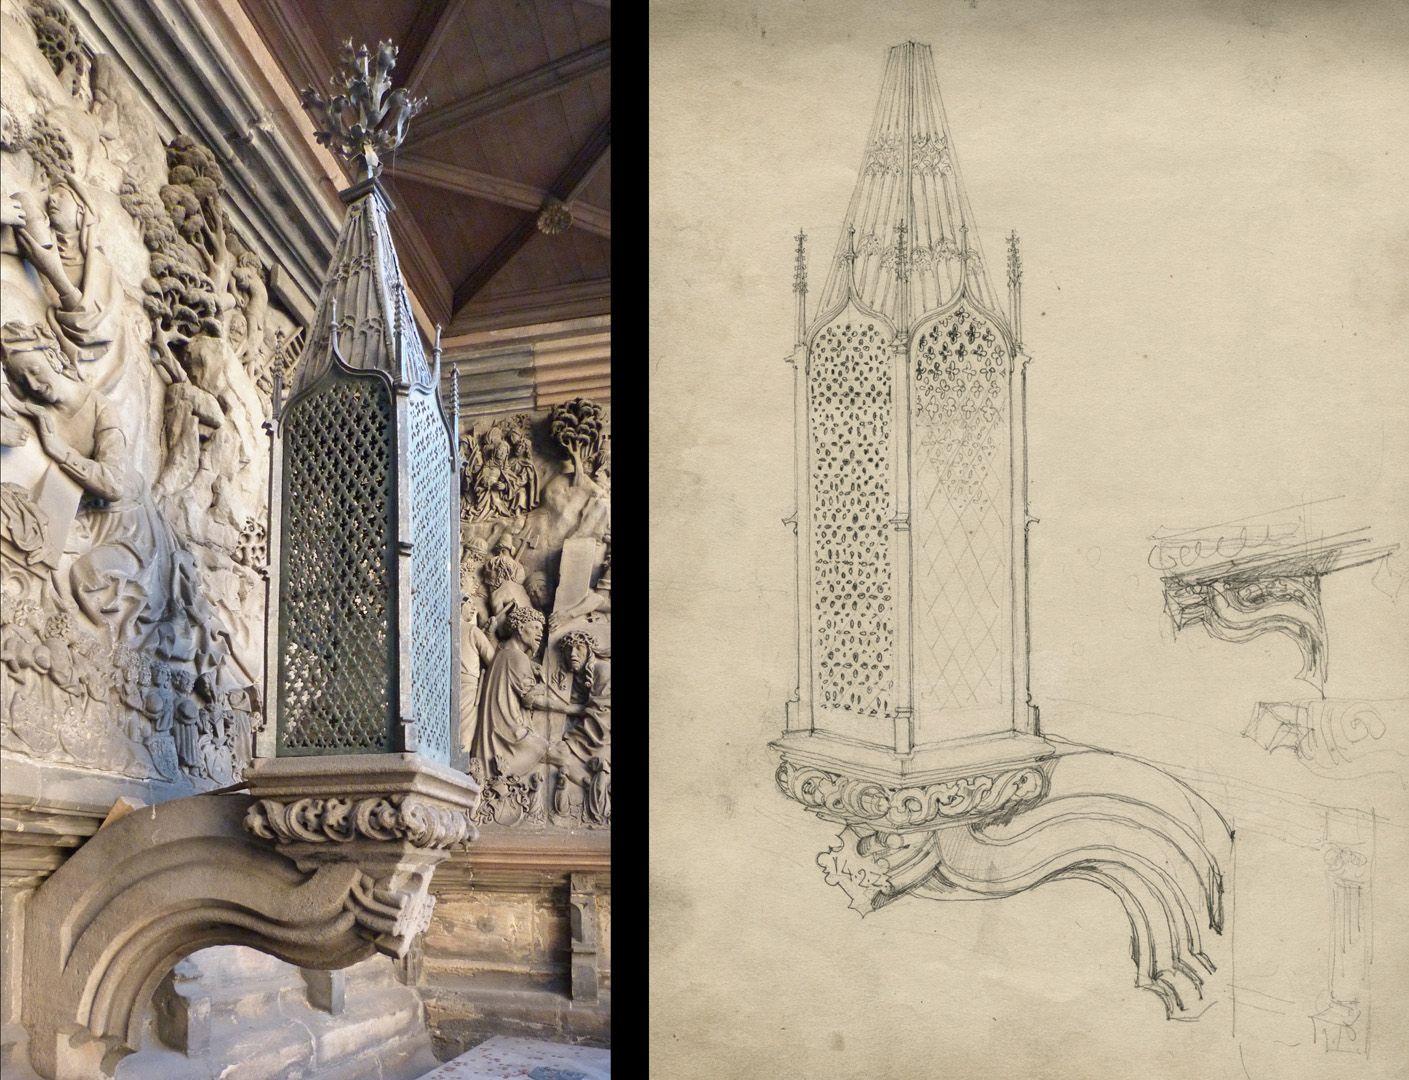 Sketchbook with views of Streitberg and Neideck / incl. Hallerweiherhaus in Nuremberg Death lamp of the Schreyer-Landauer epitaph at the Sebaldus church, photo comparison